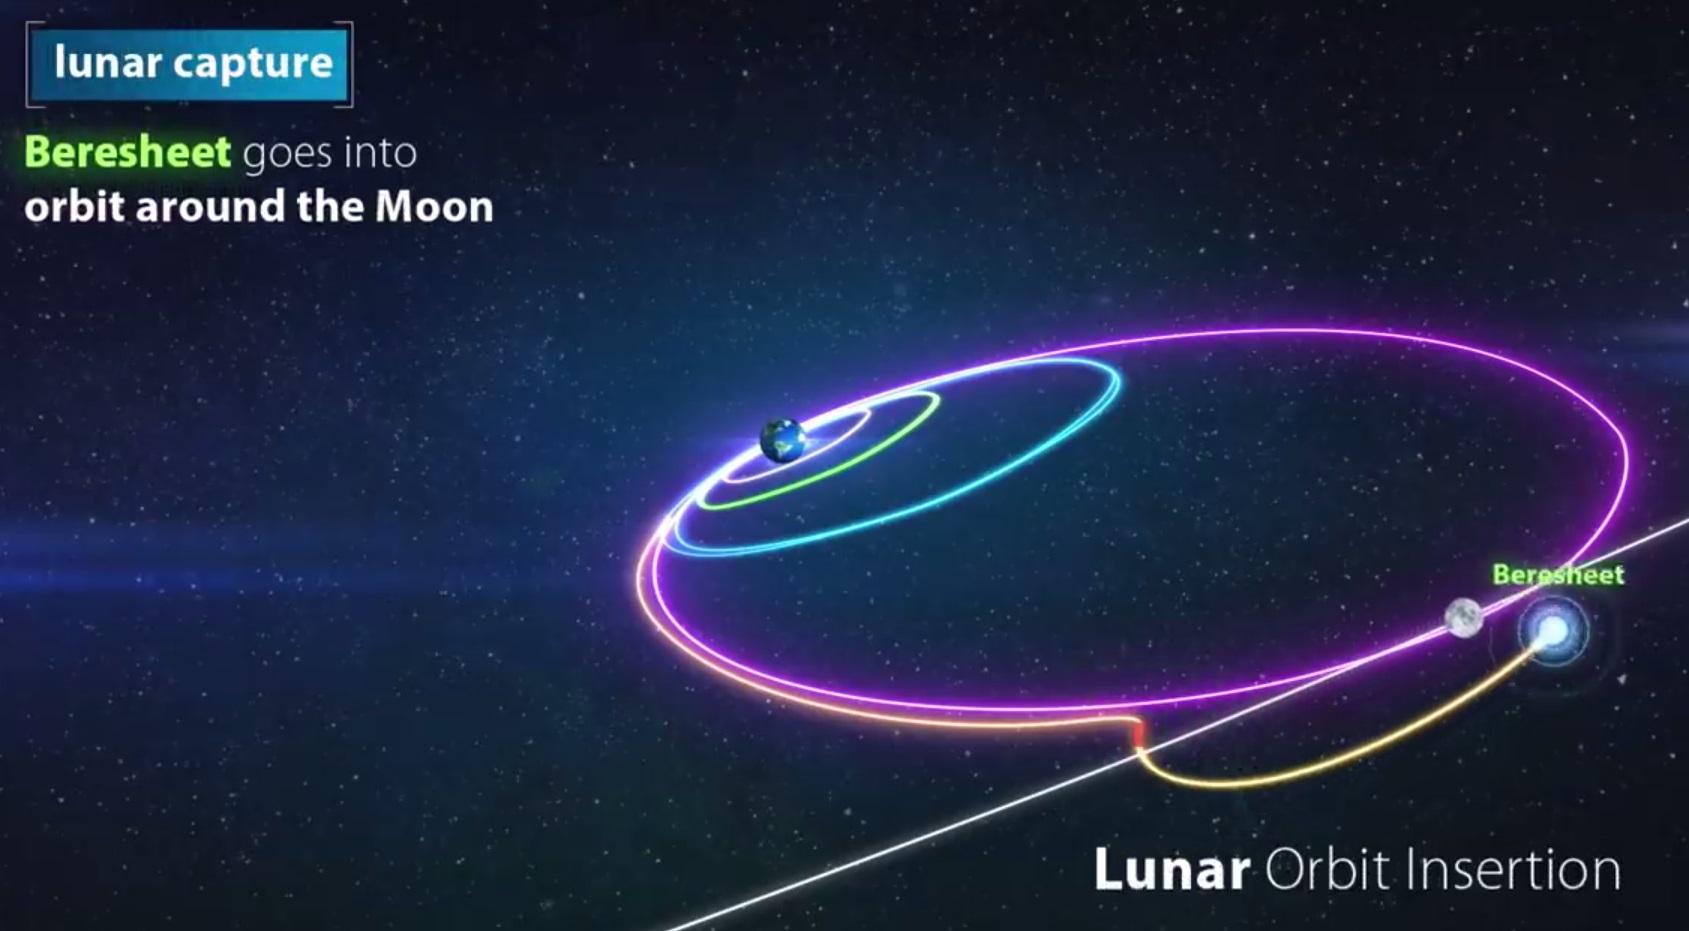 Лунная миссия «Берешит» — есть посадка на Луну (технически) - 21